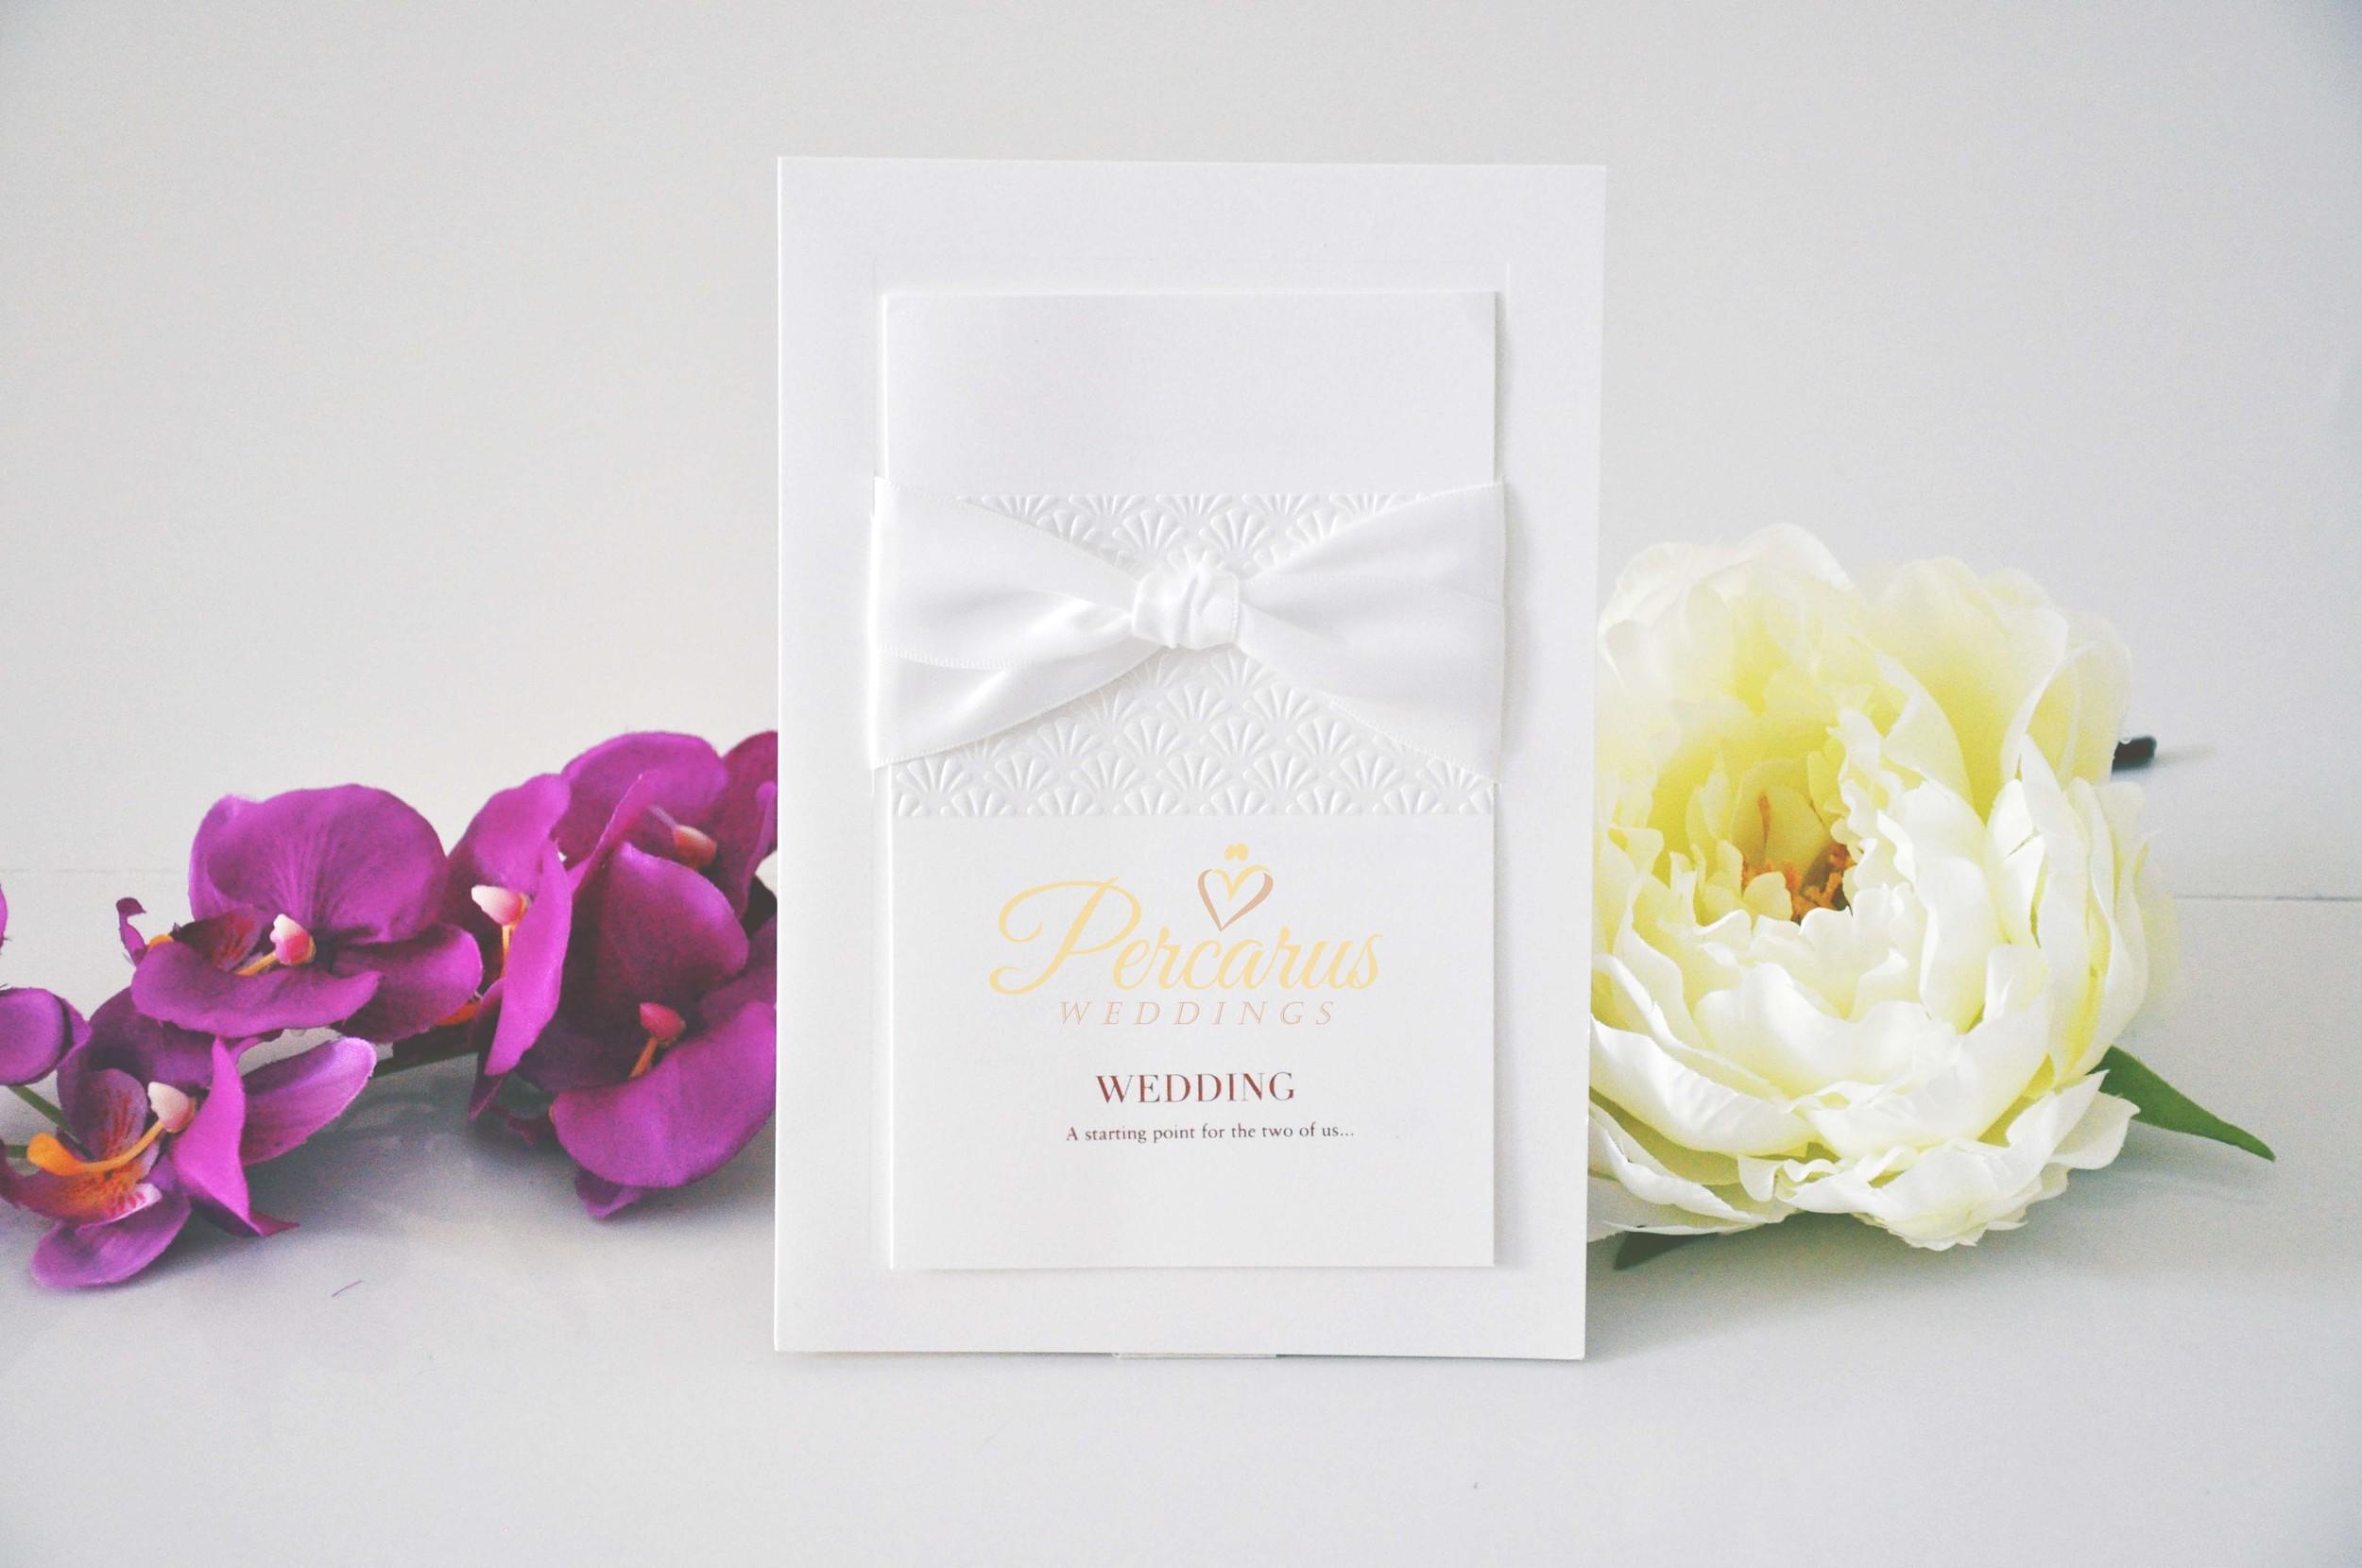 luxury-white-ribbon-with-mounted-white-invitation